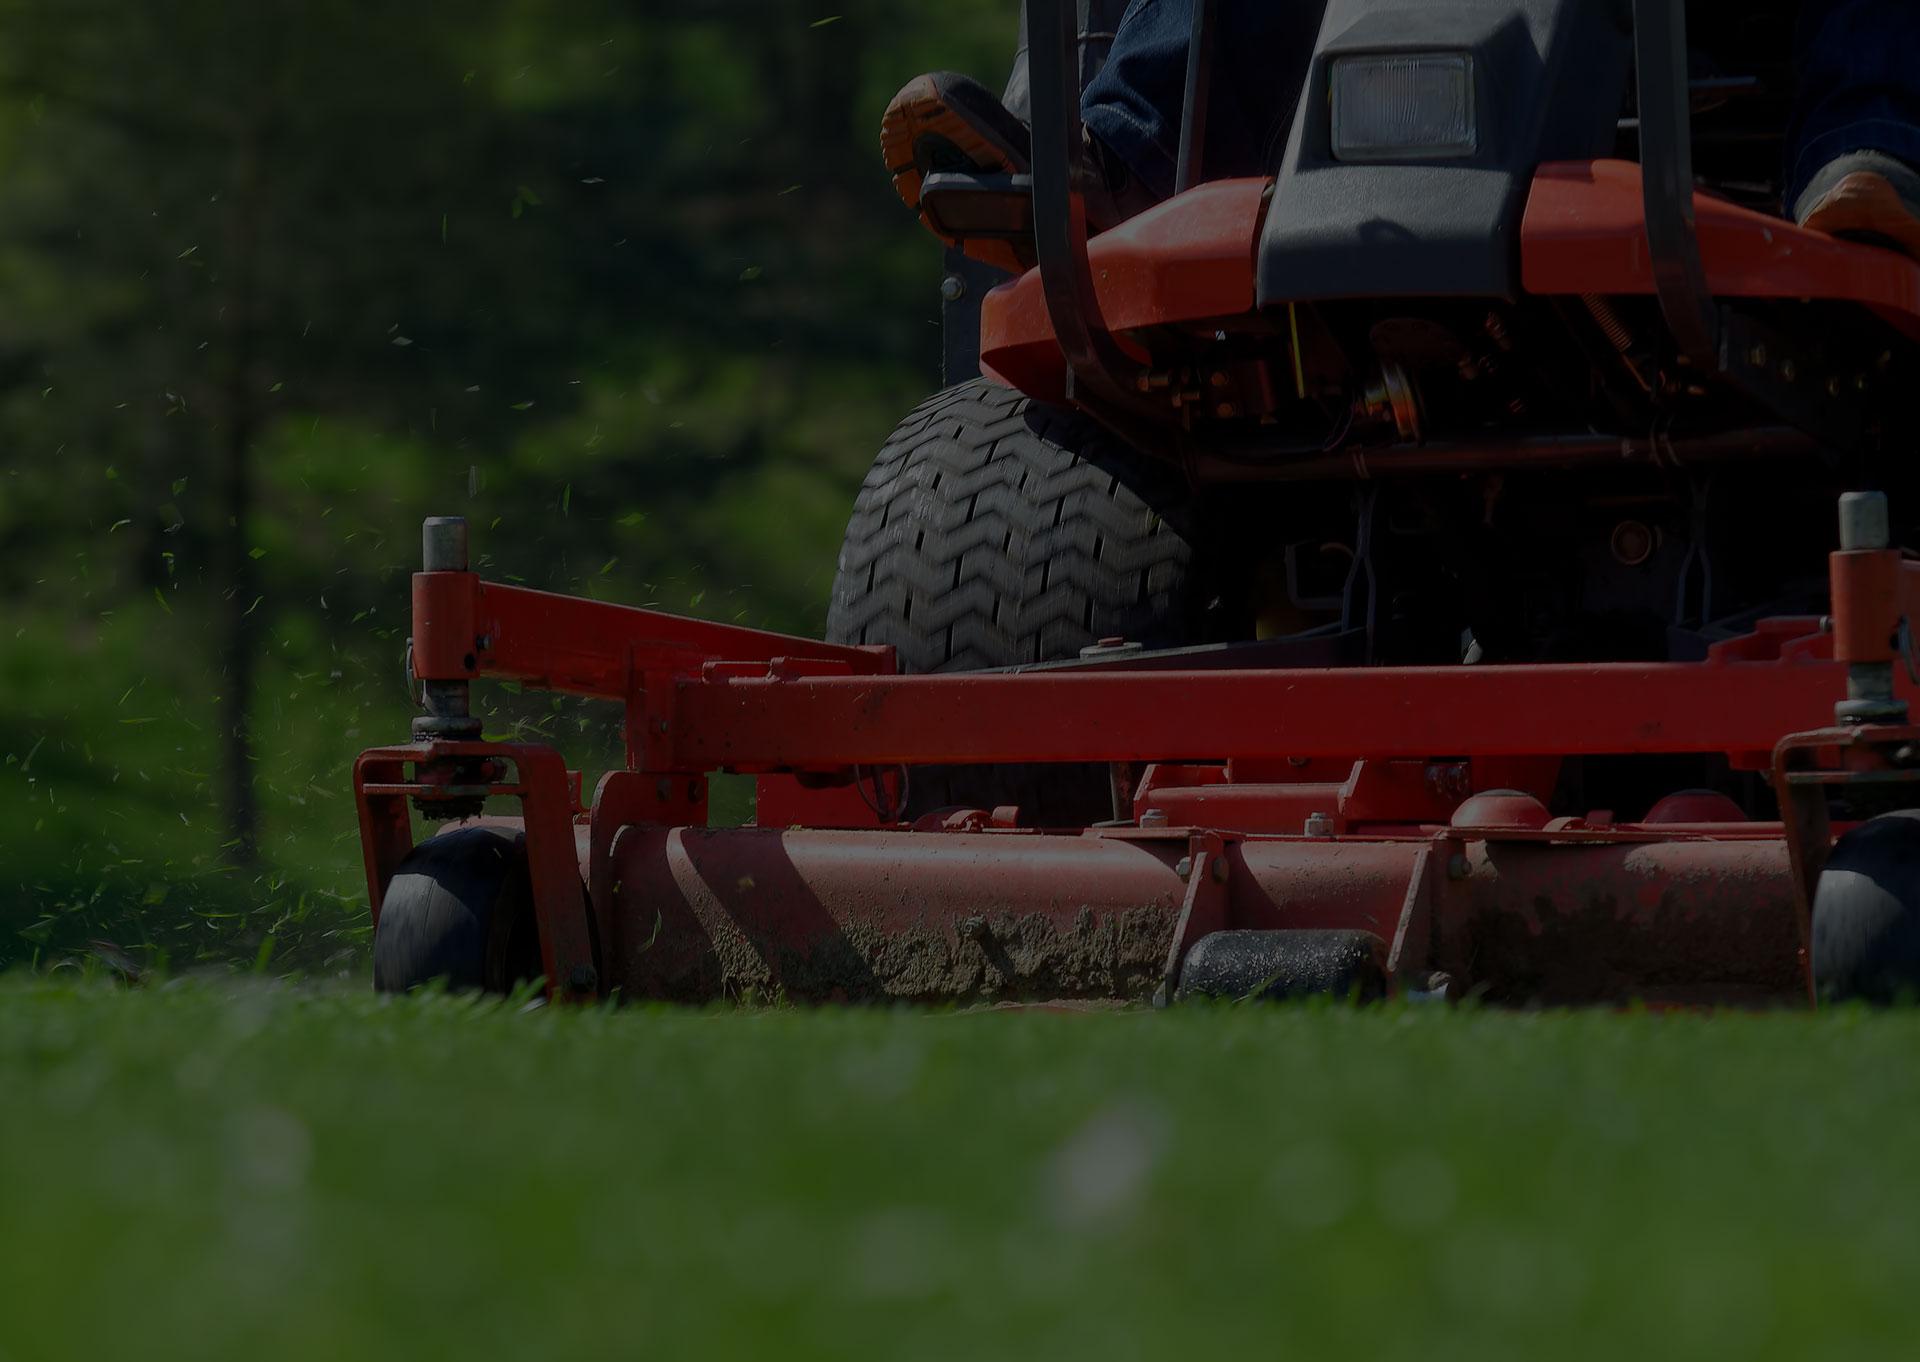 man riding on lawn mower